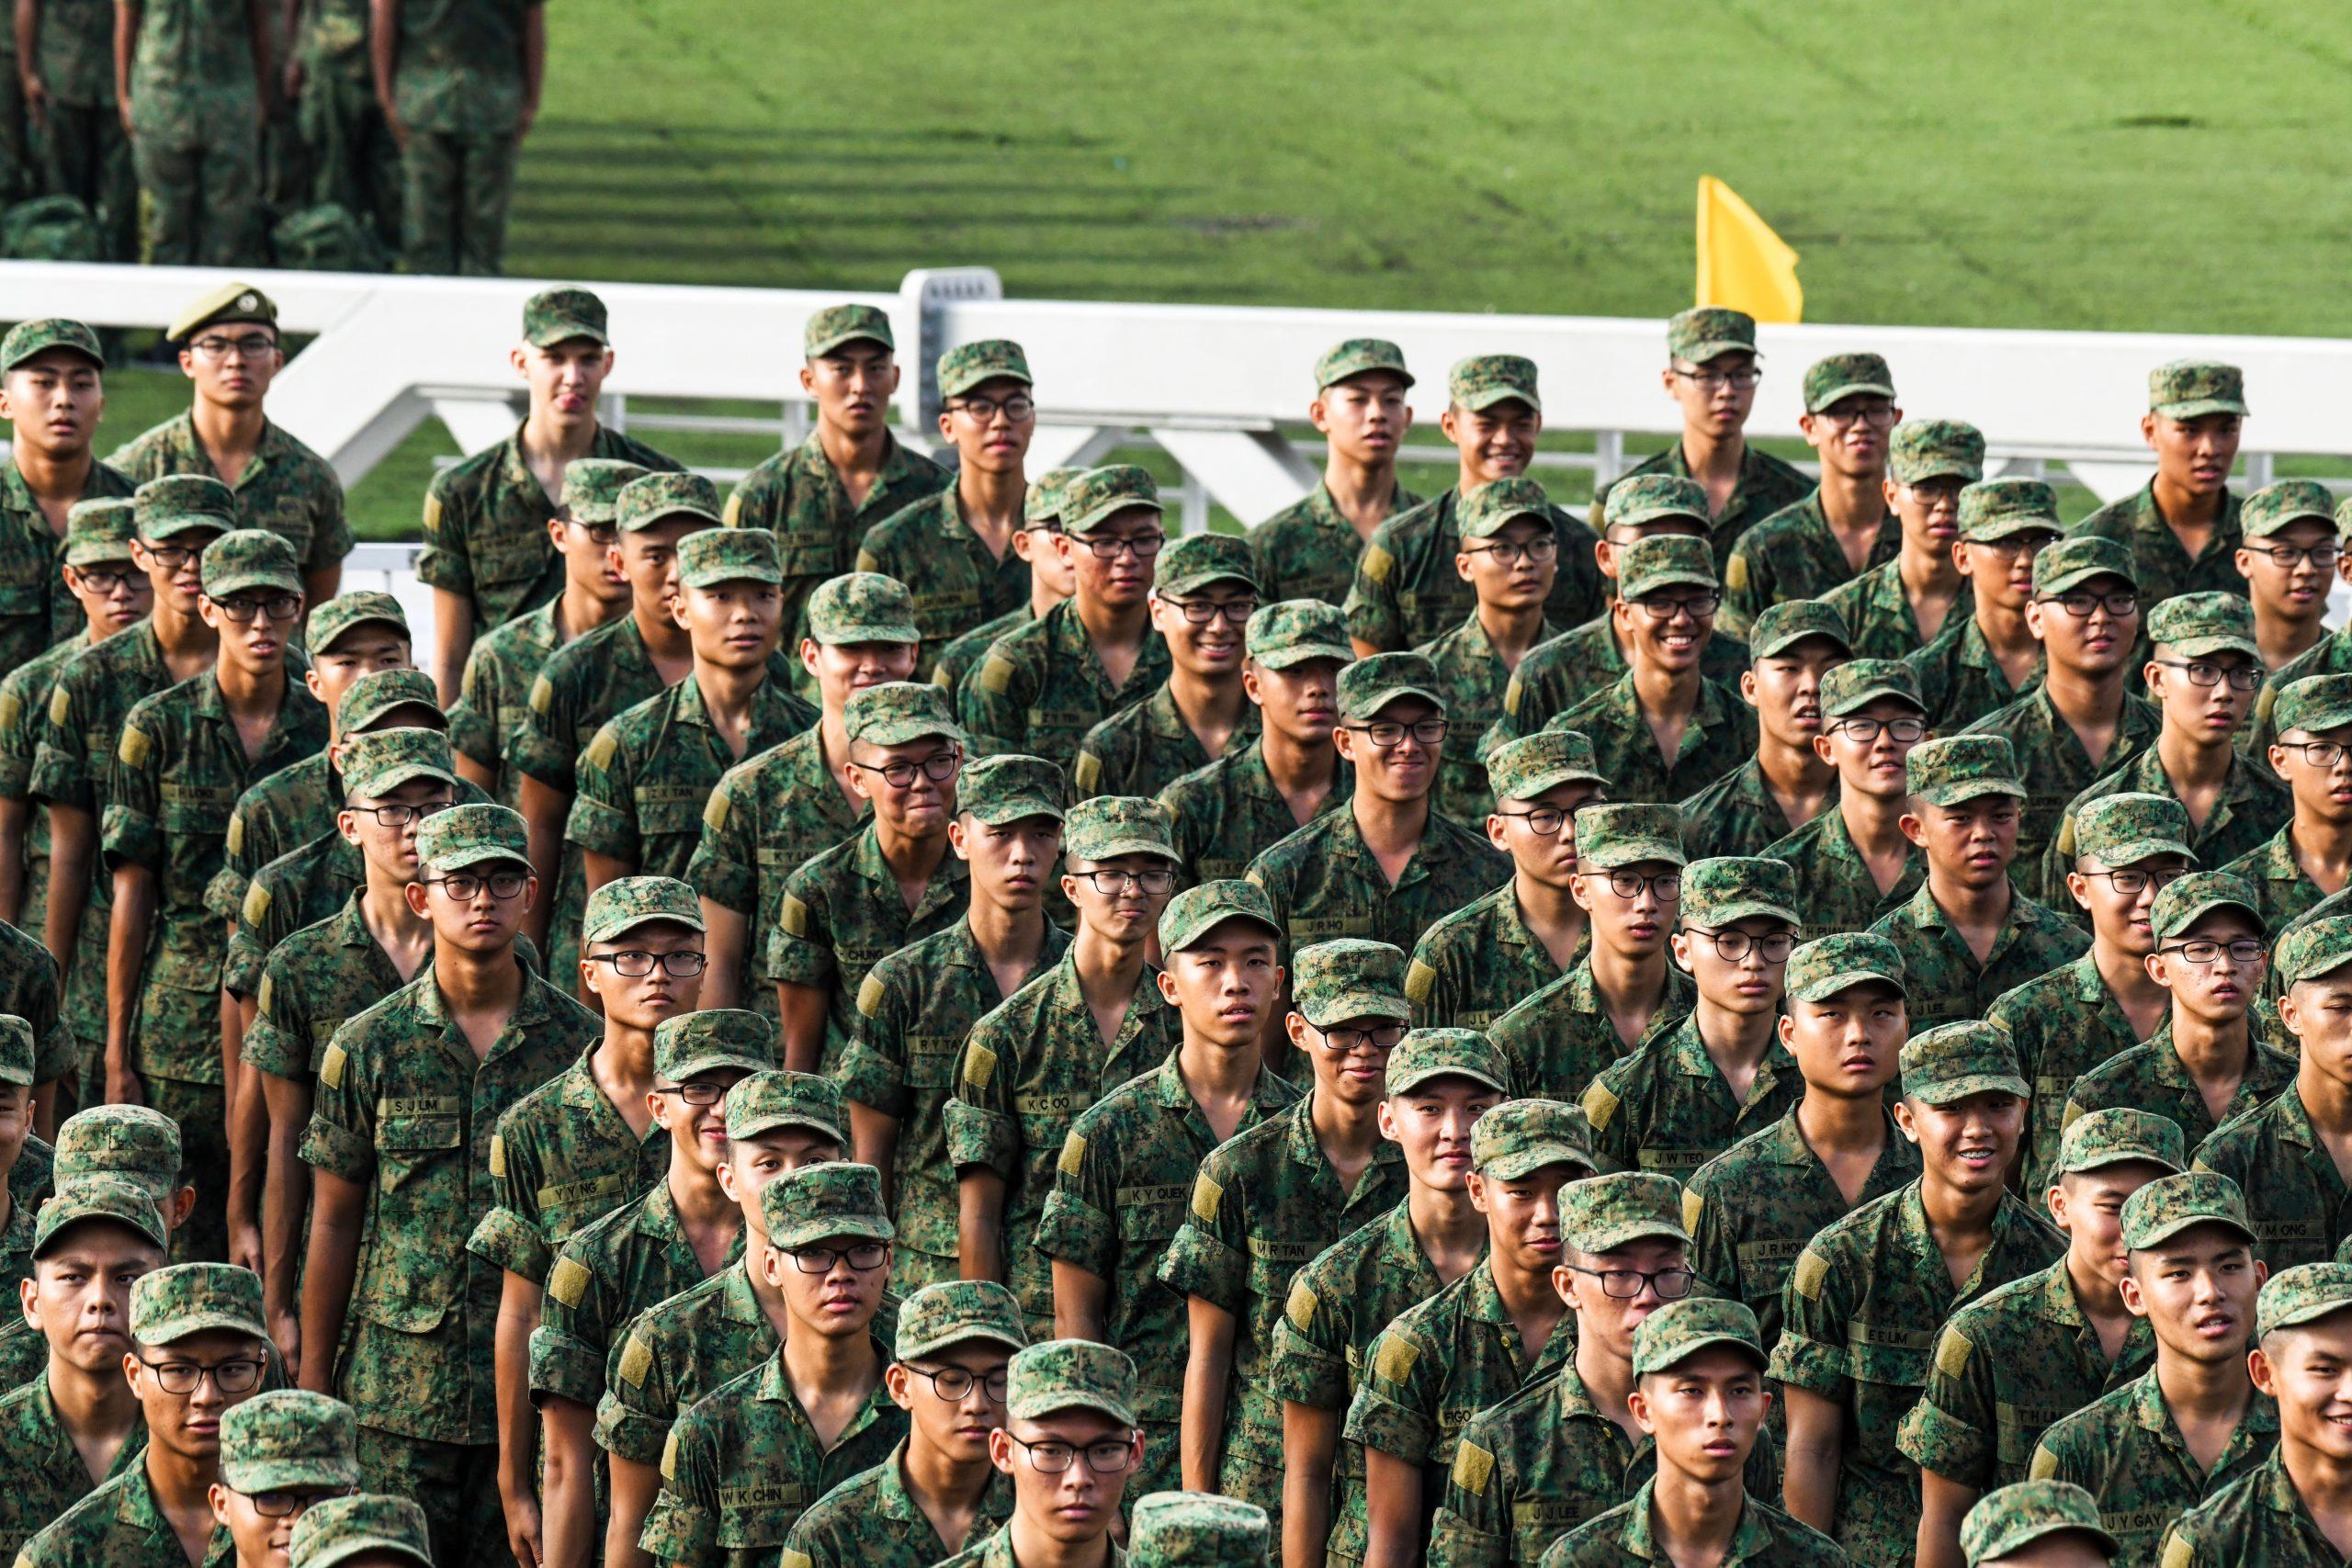 Mandatory National Service bao-menglong-5eElIuUTQU8-unsplash